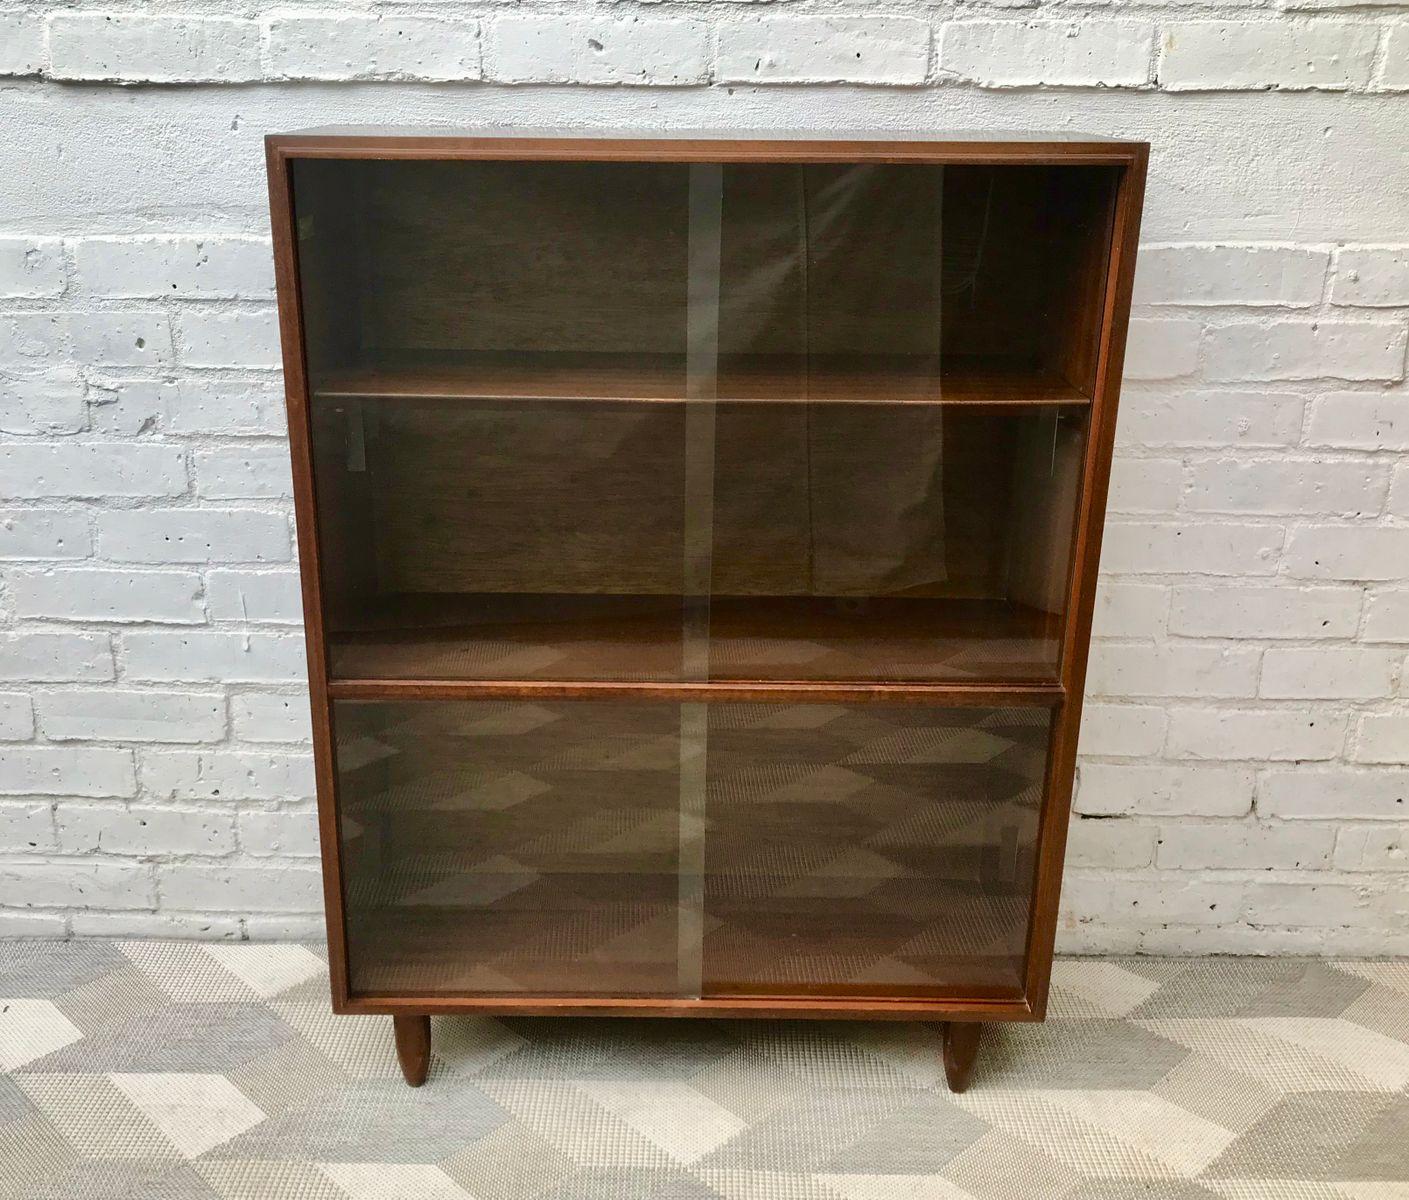 de a royal society merveilles petites sewing cabinet spool vintage